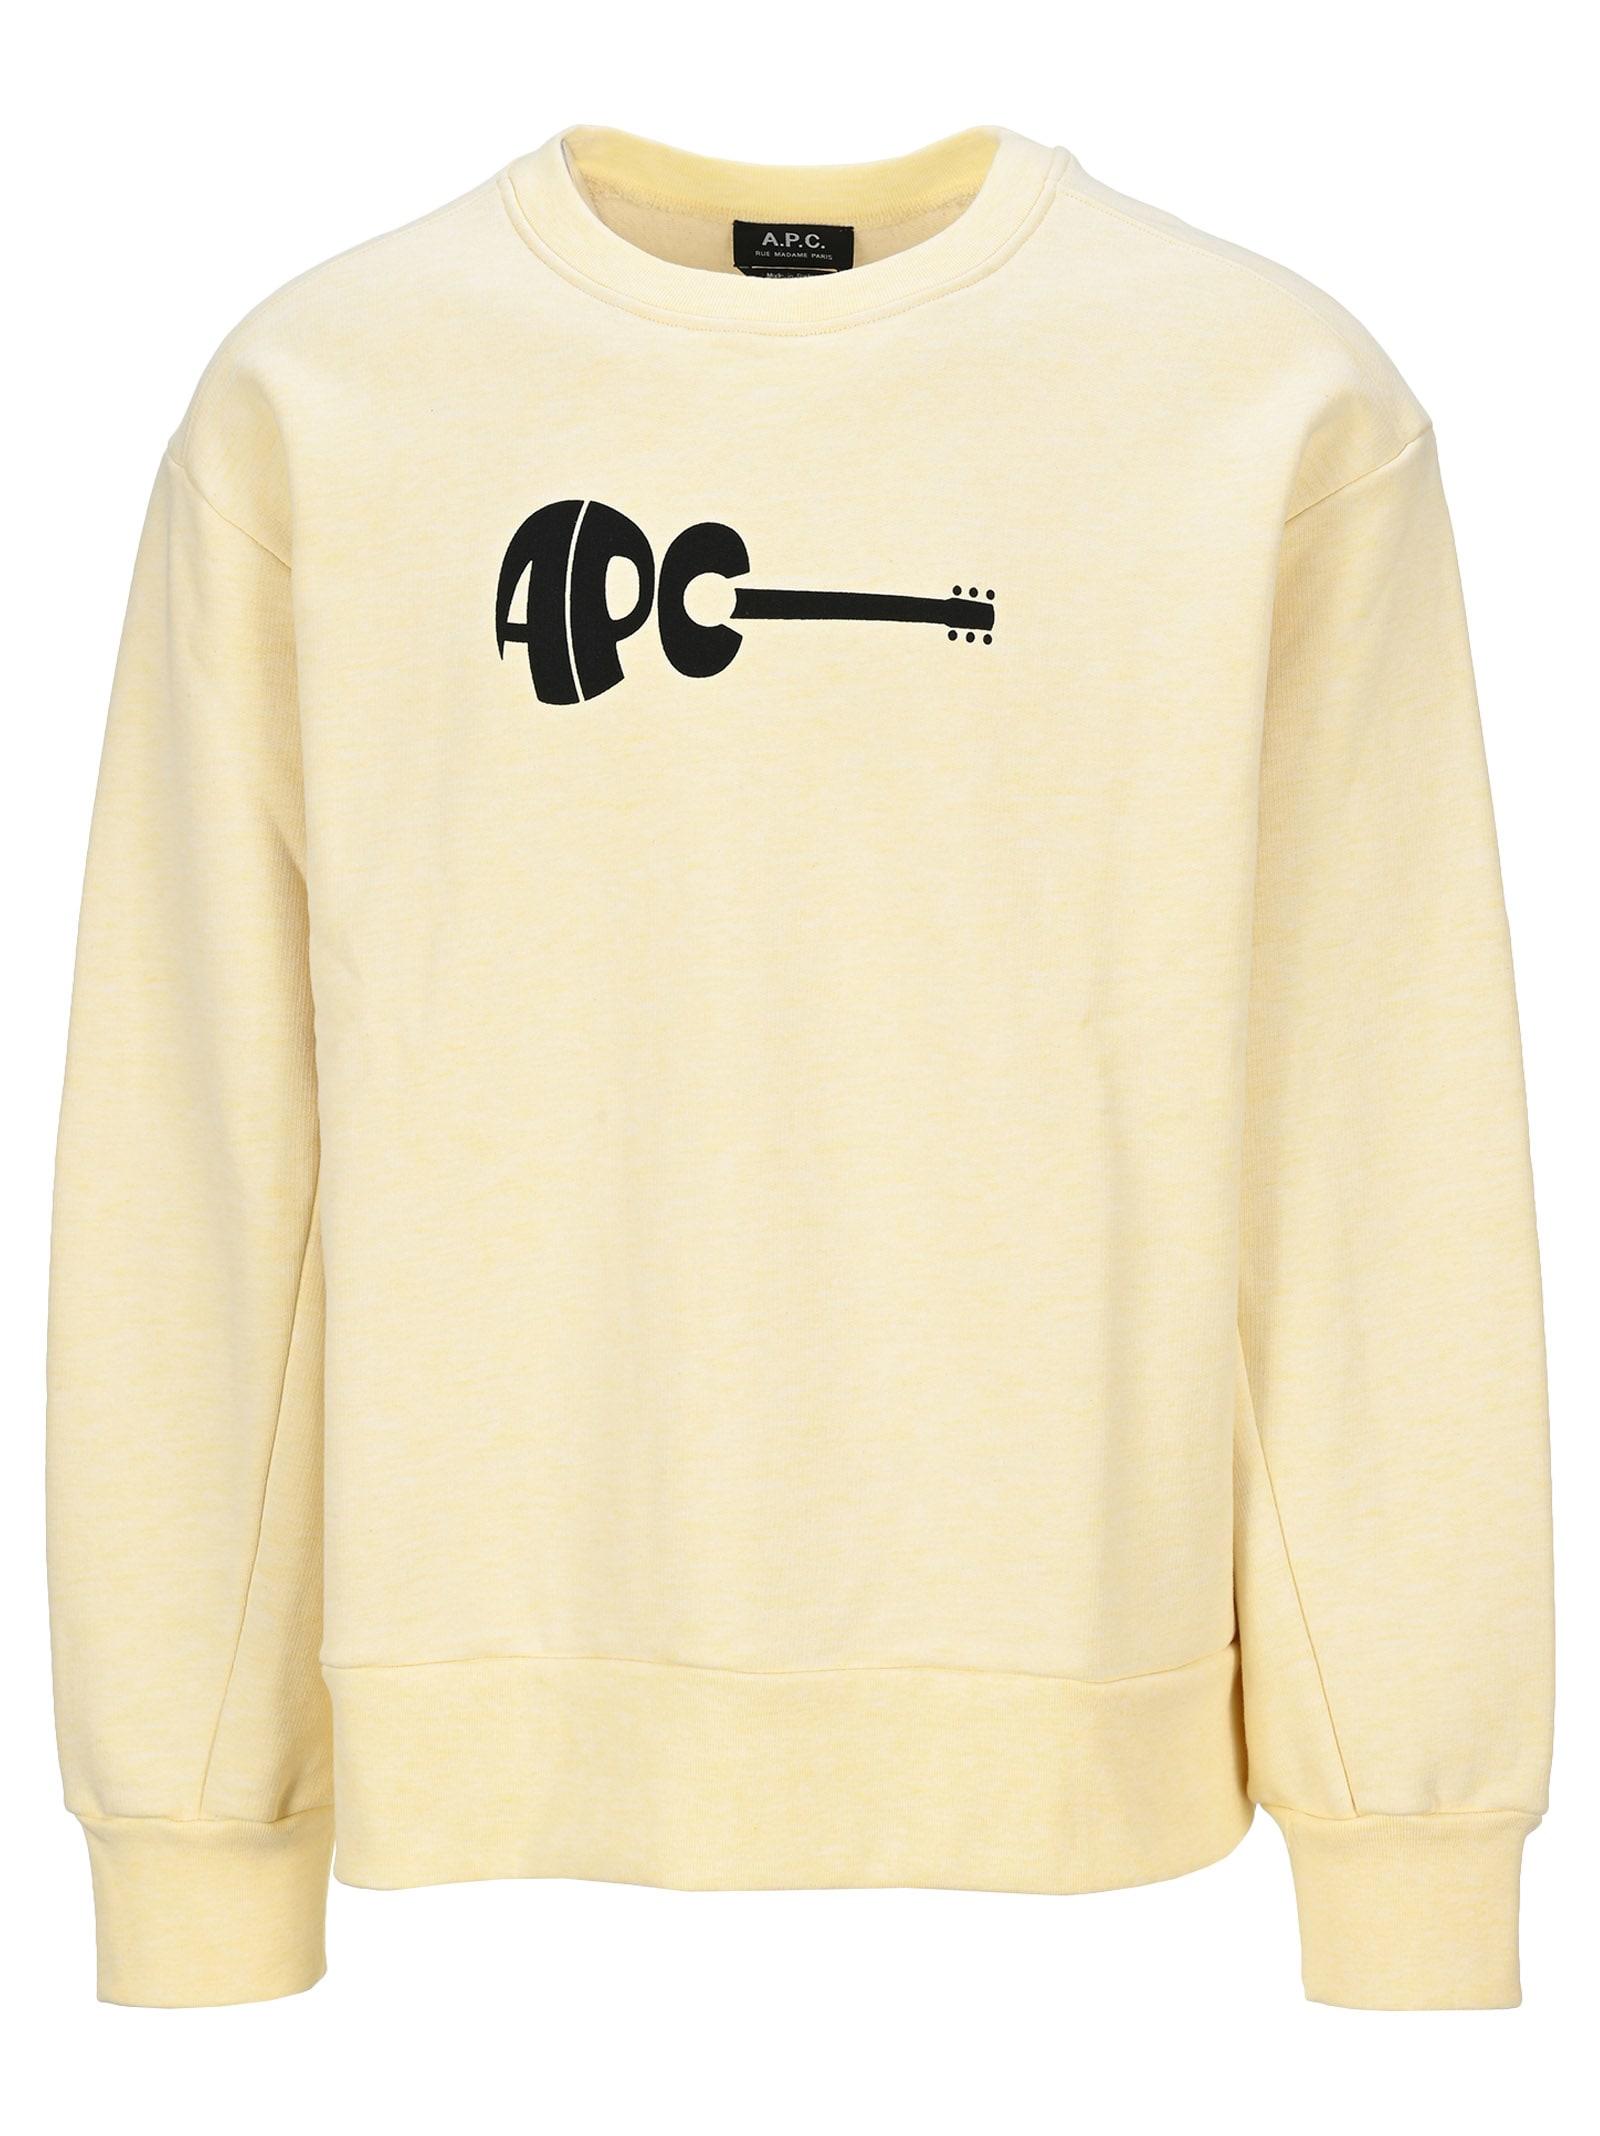 A.p.c. Guitar Crewneck Swetshirt In Yellow Ocra